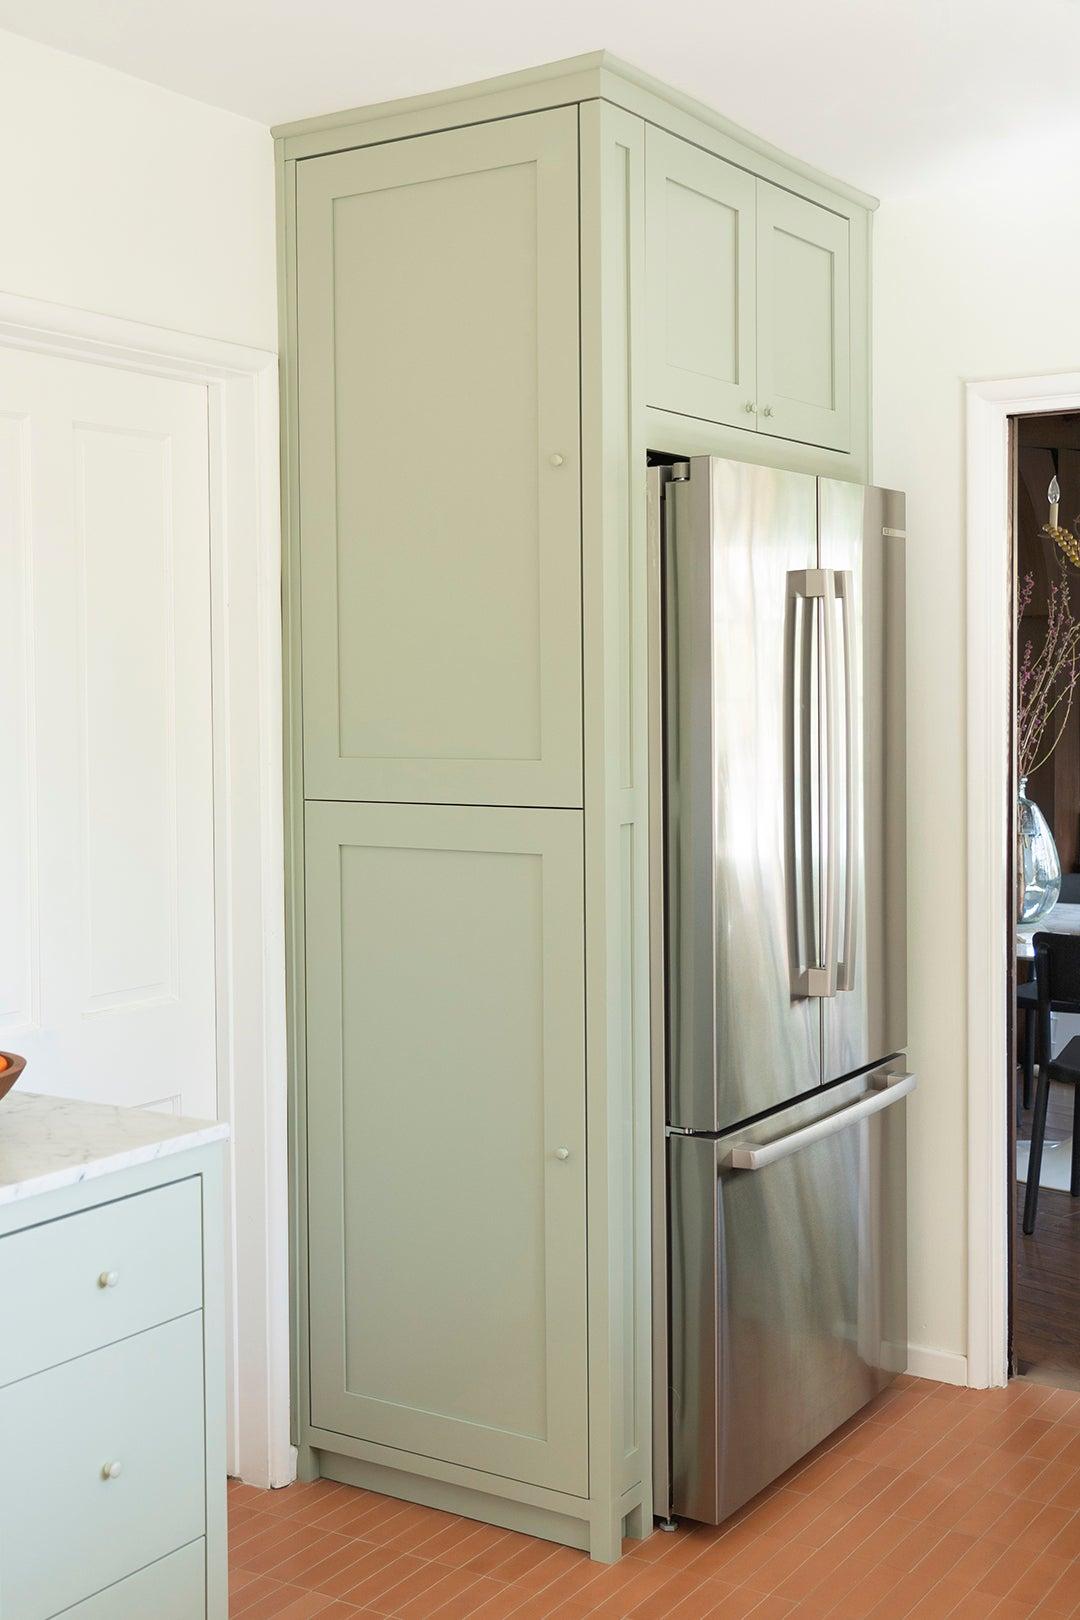 fridge inset into green cabinets